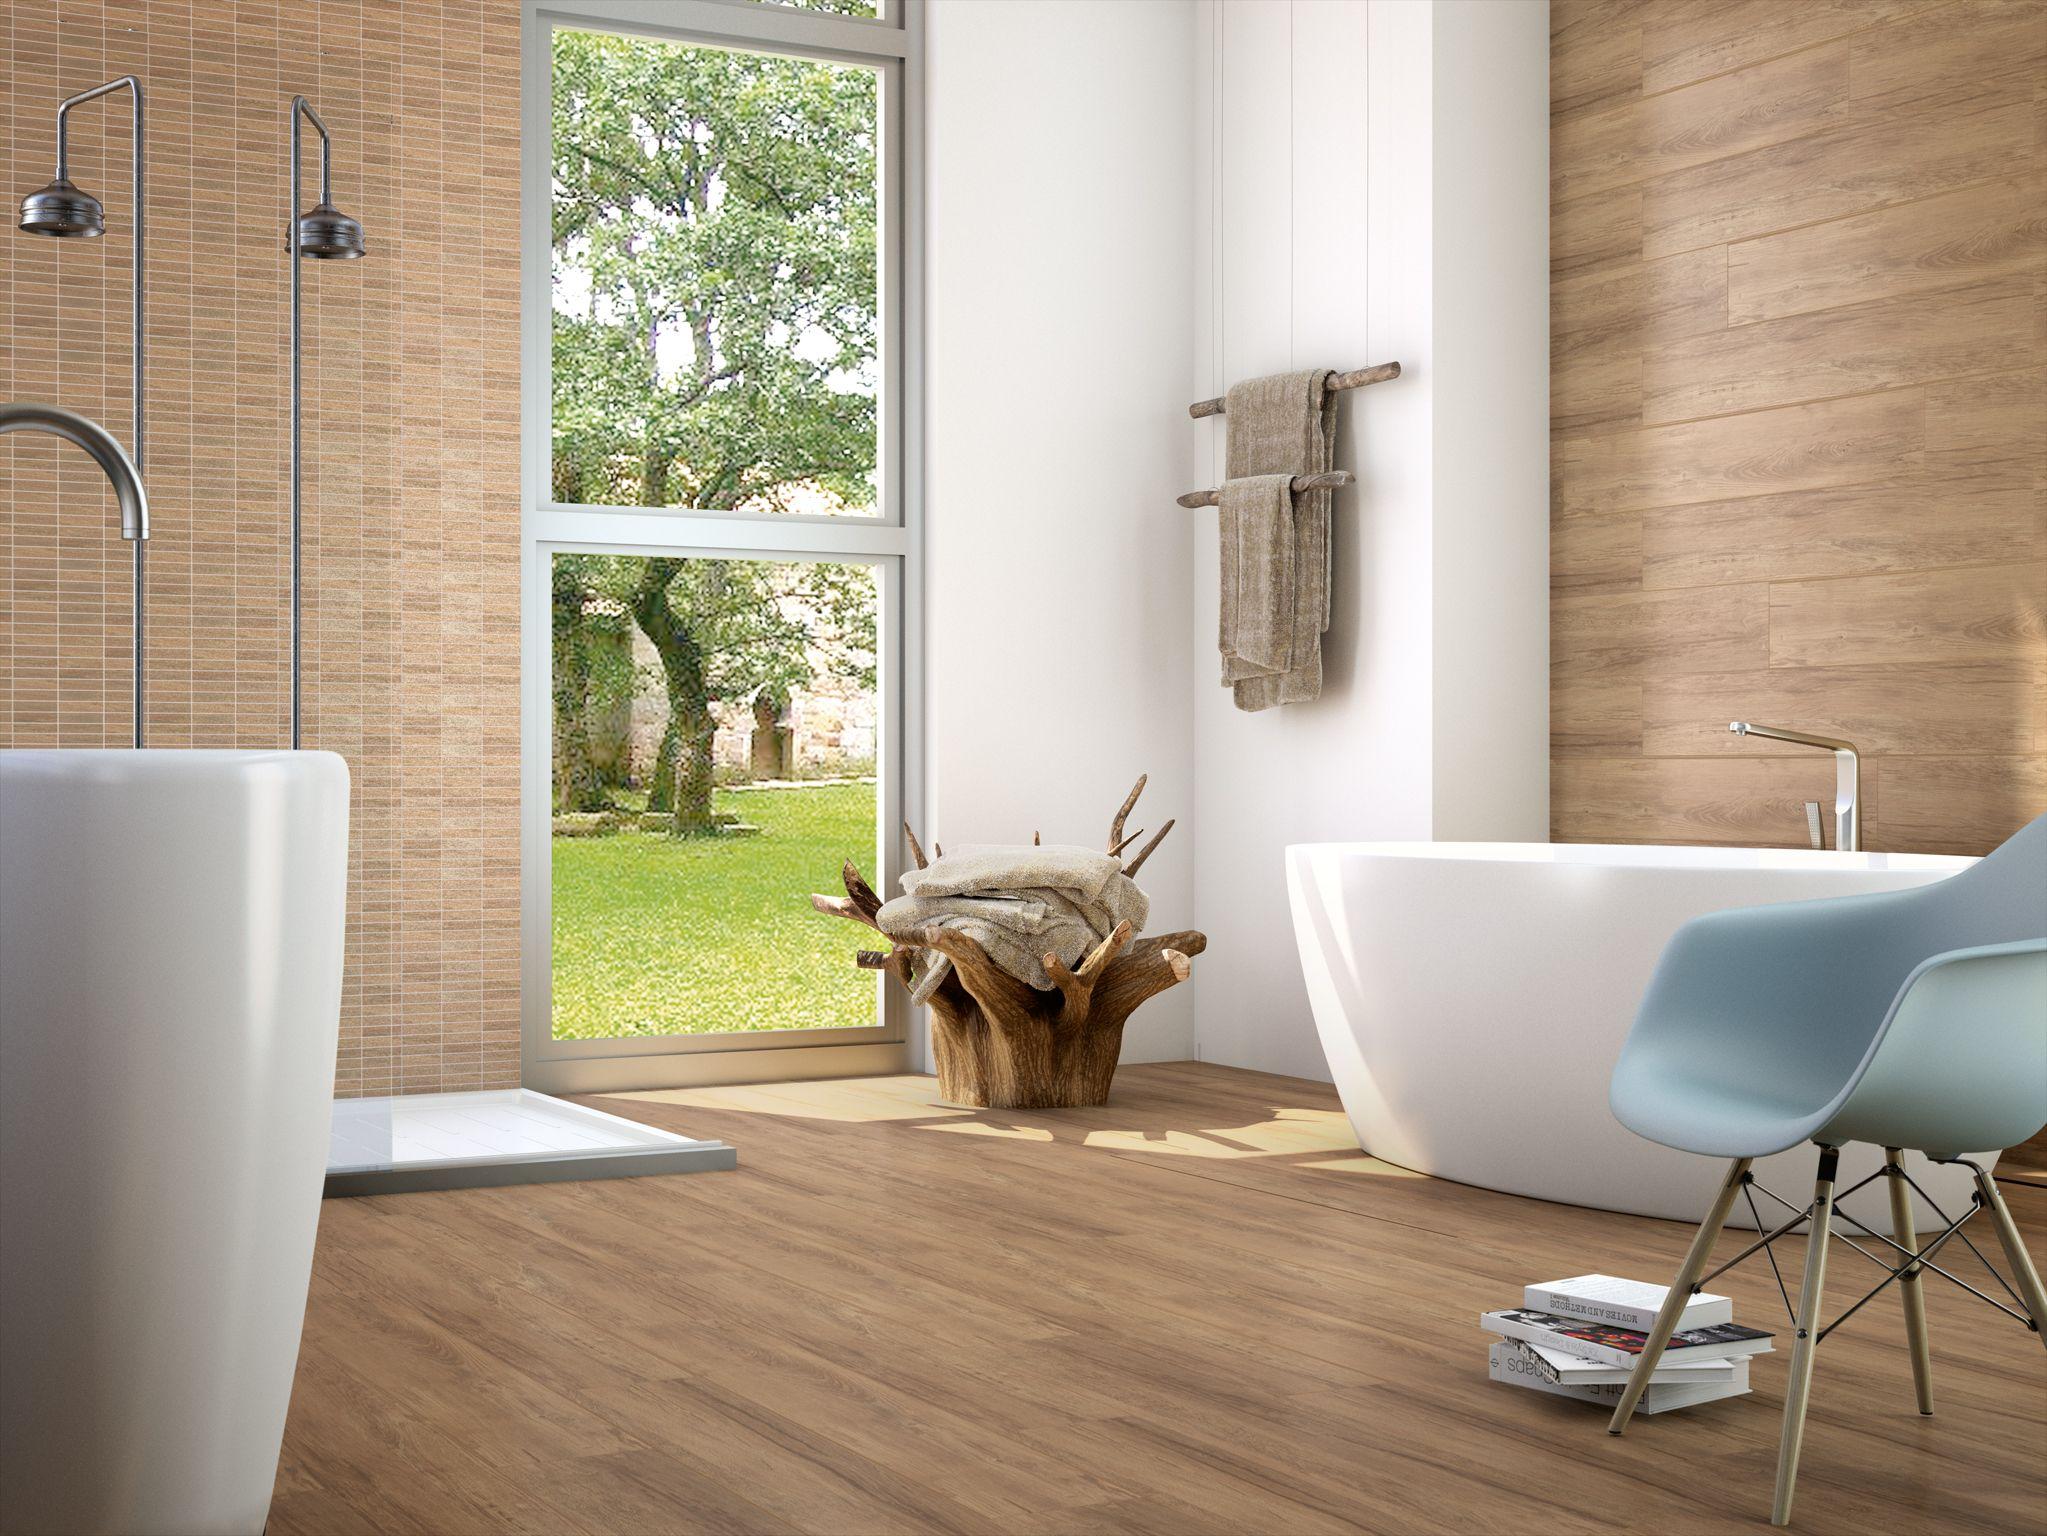 Pavimento porcel nico madera MARAT 1 x